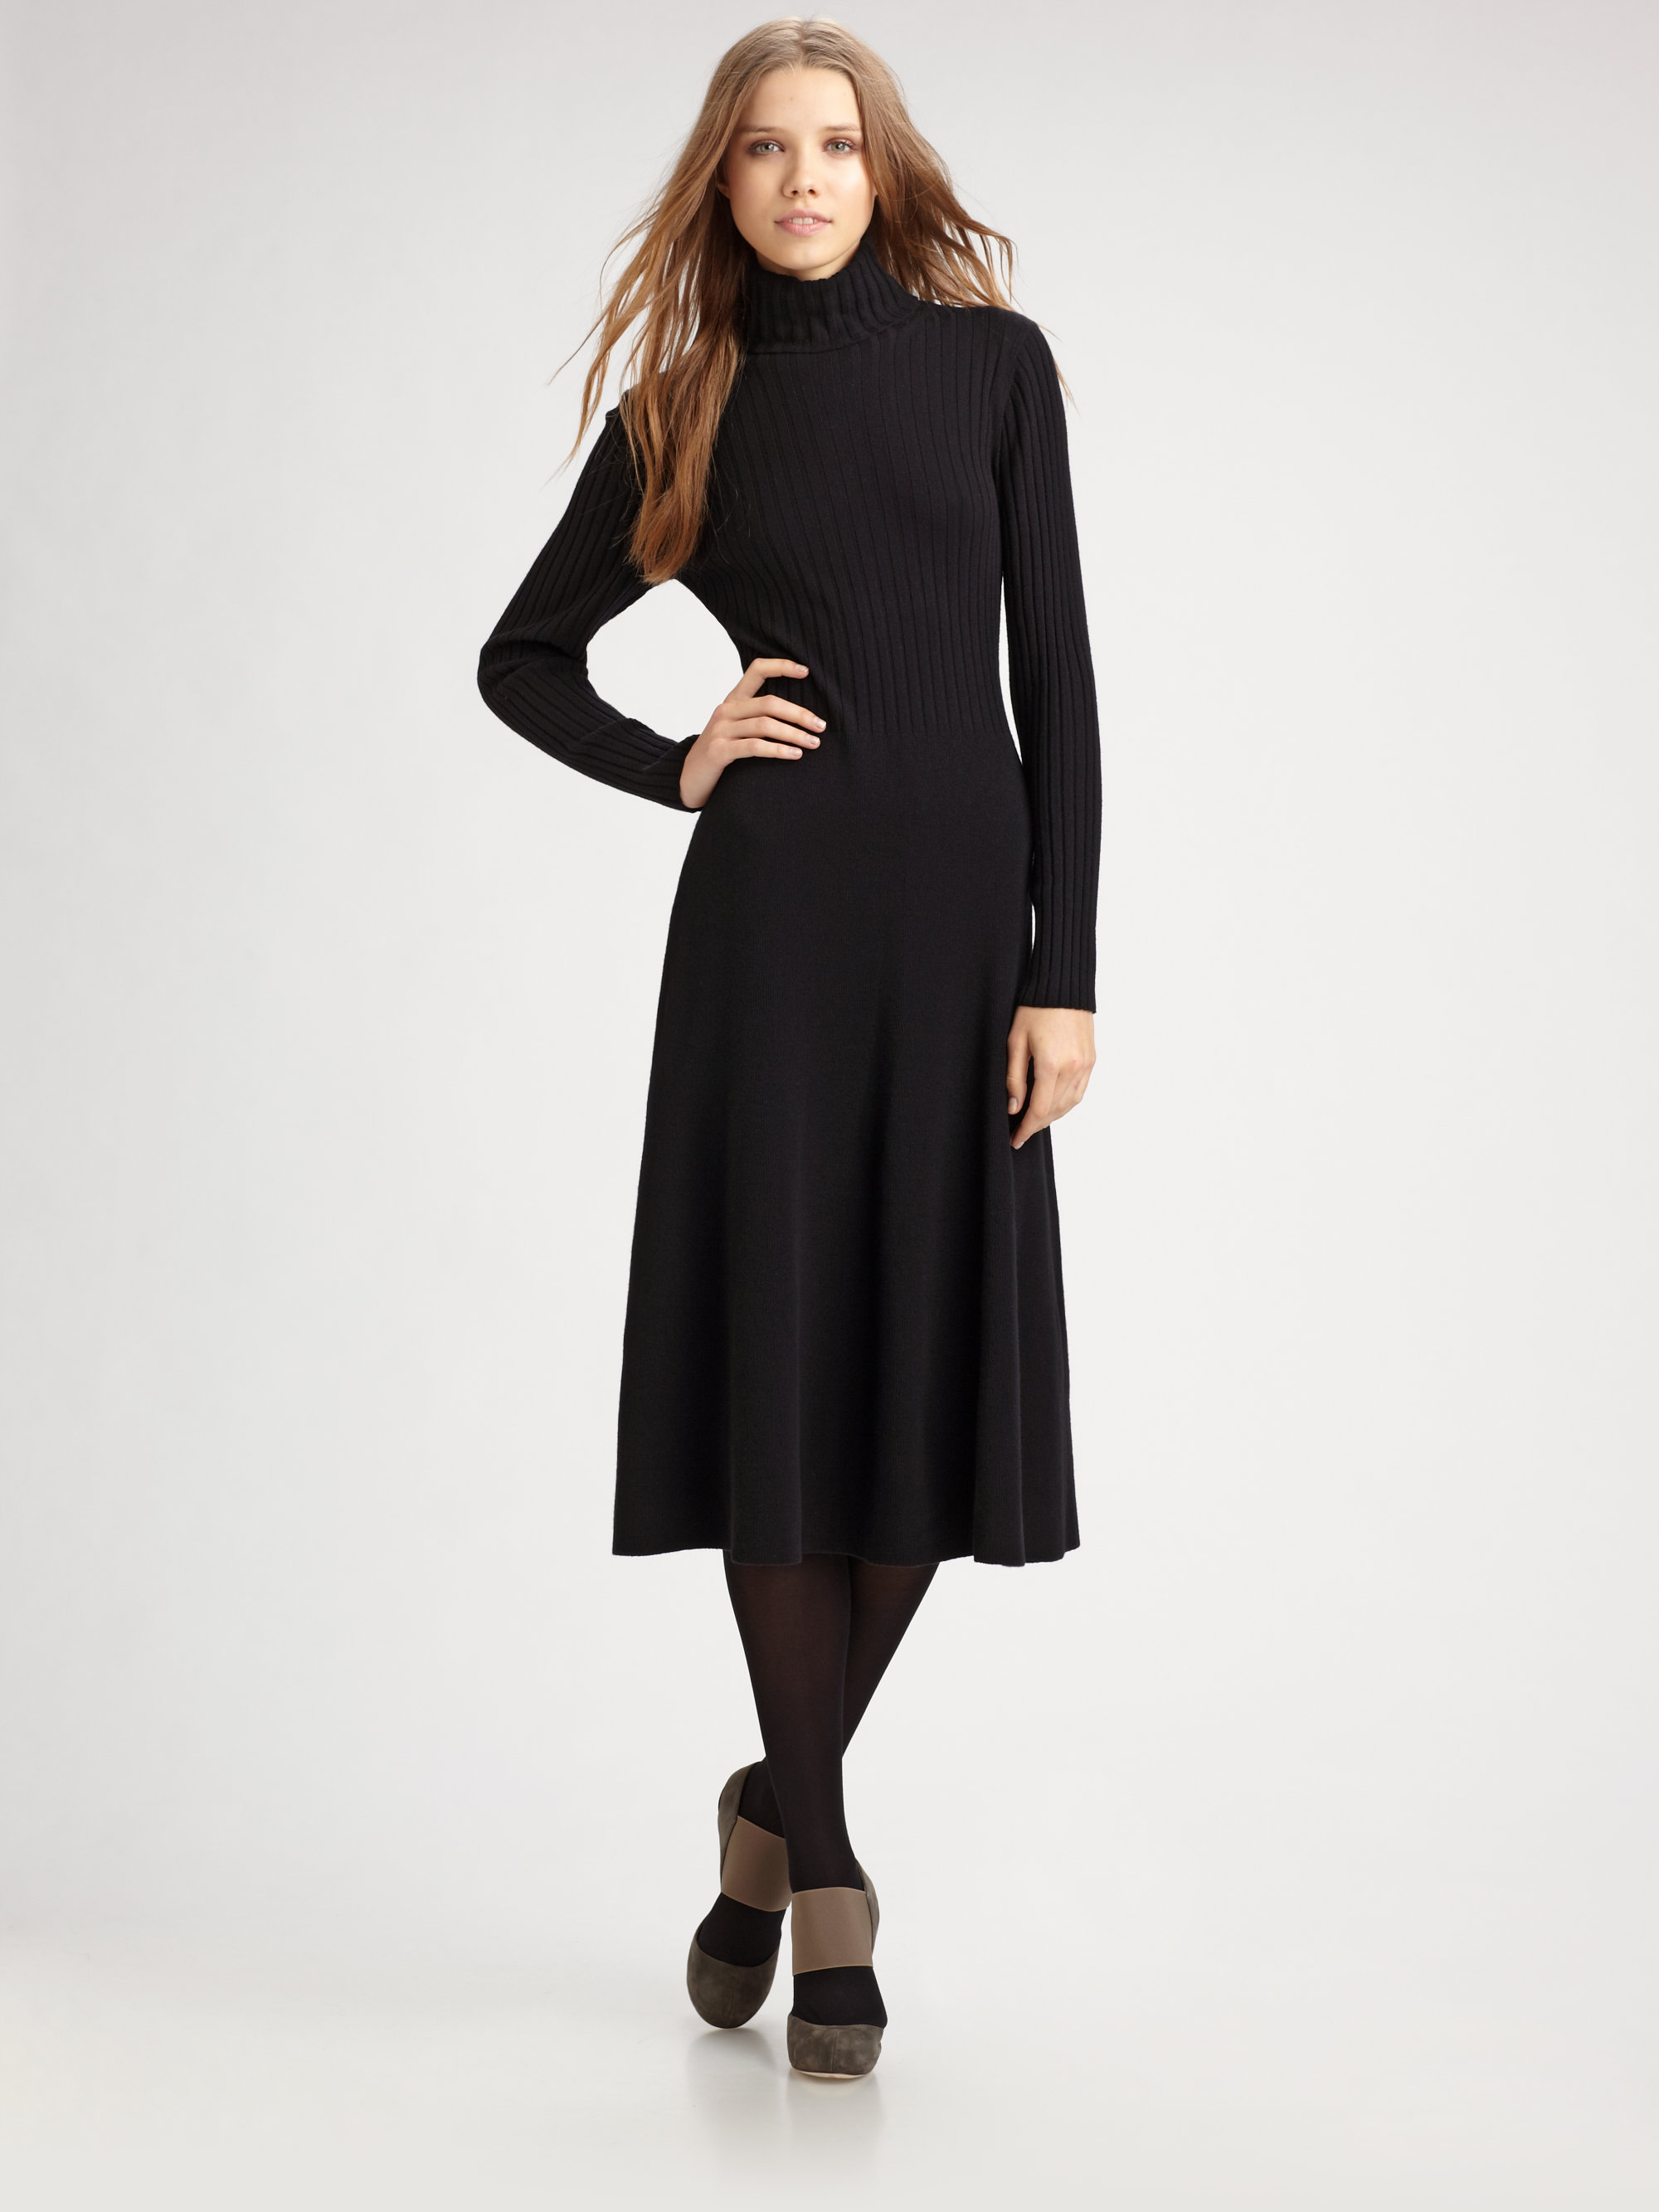 Lyst Lafayette 148 New York Merino Wool Turtleneck Dress